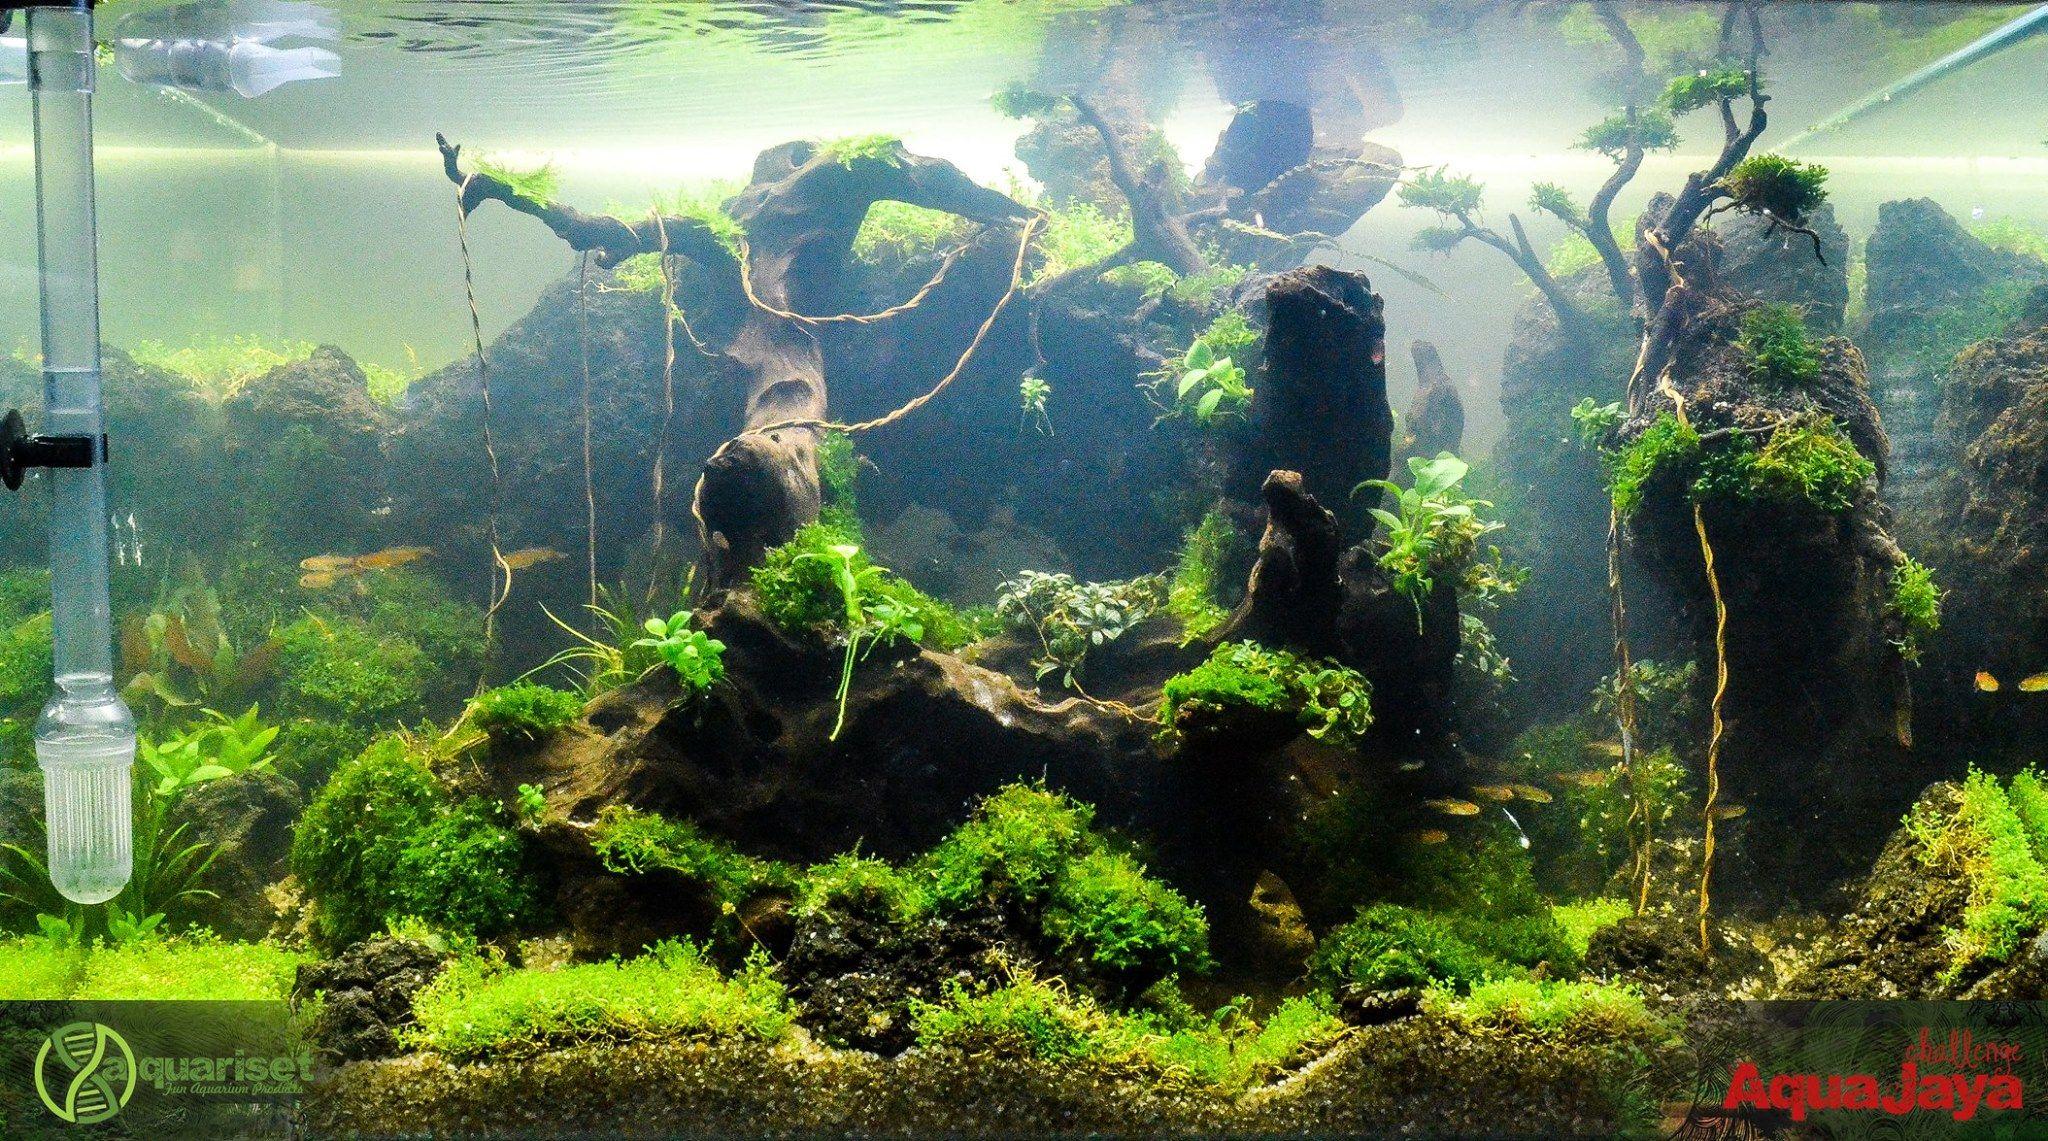 Pin by Stephanus Mardianto on Aquascape | Aquarium, Fish ...